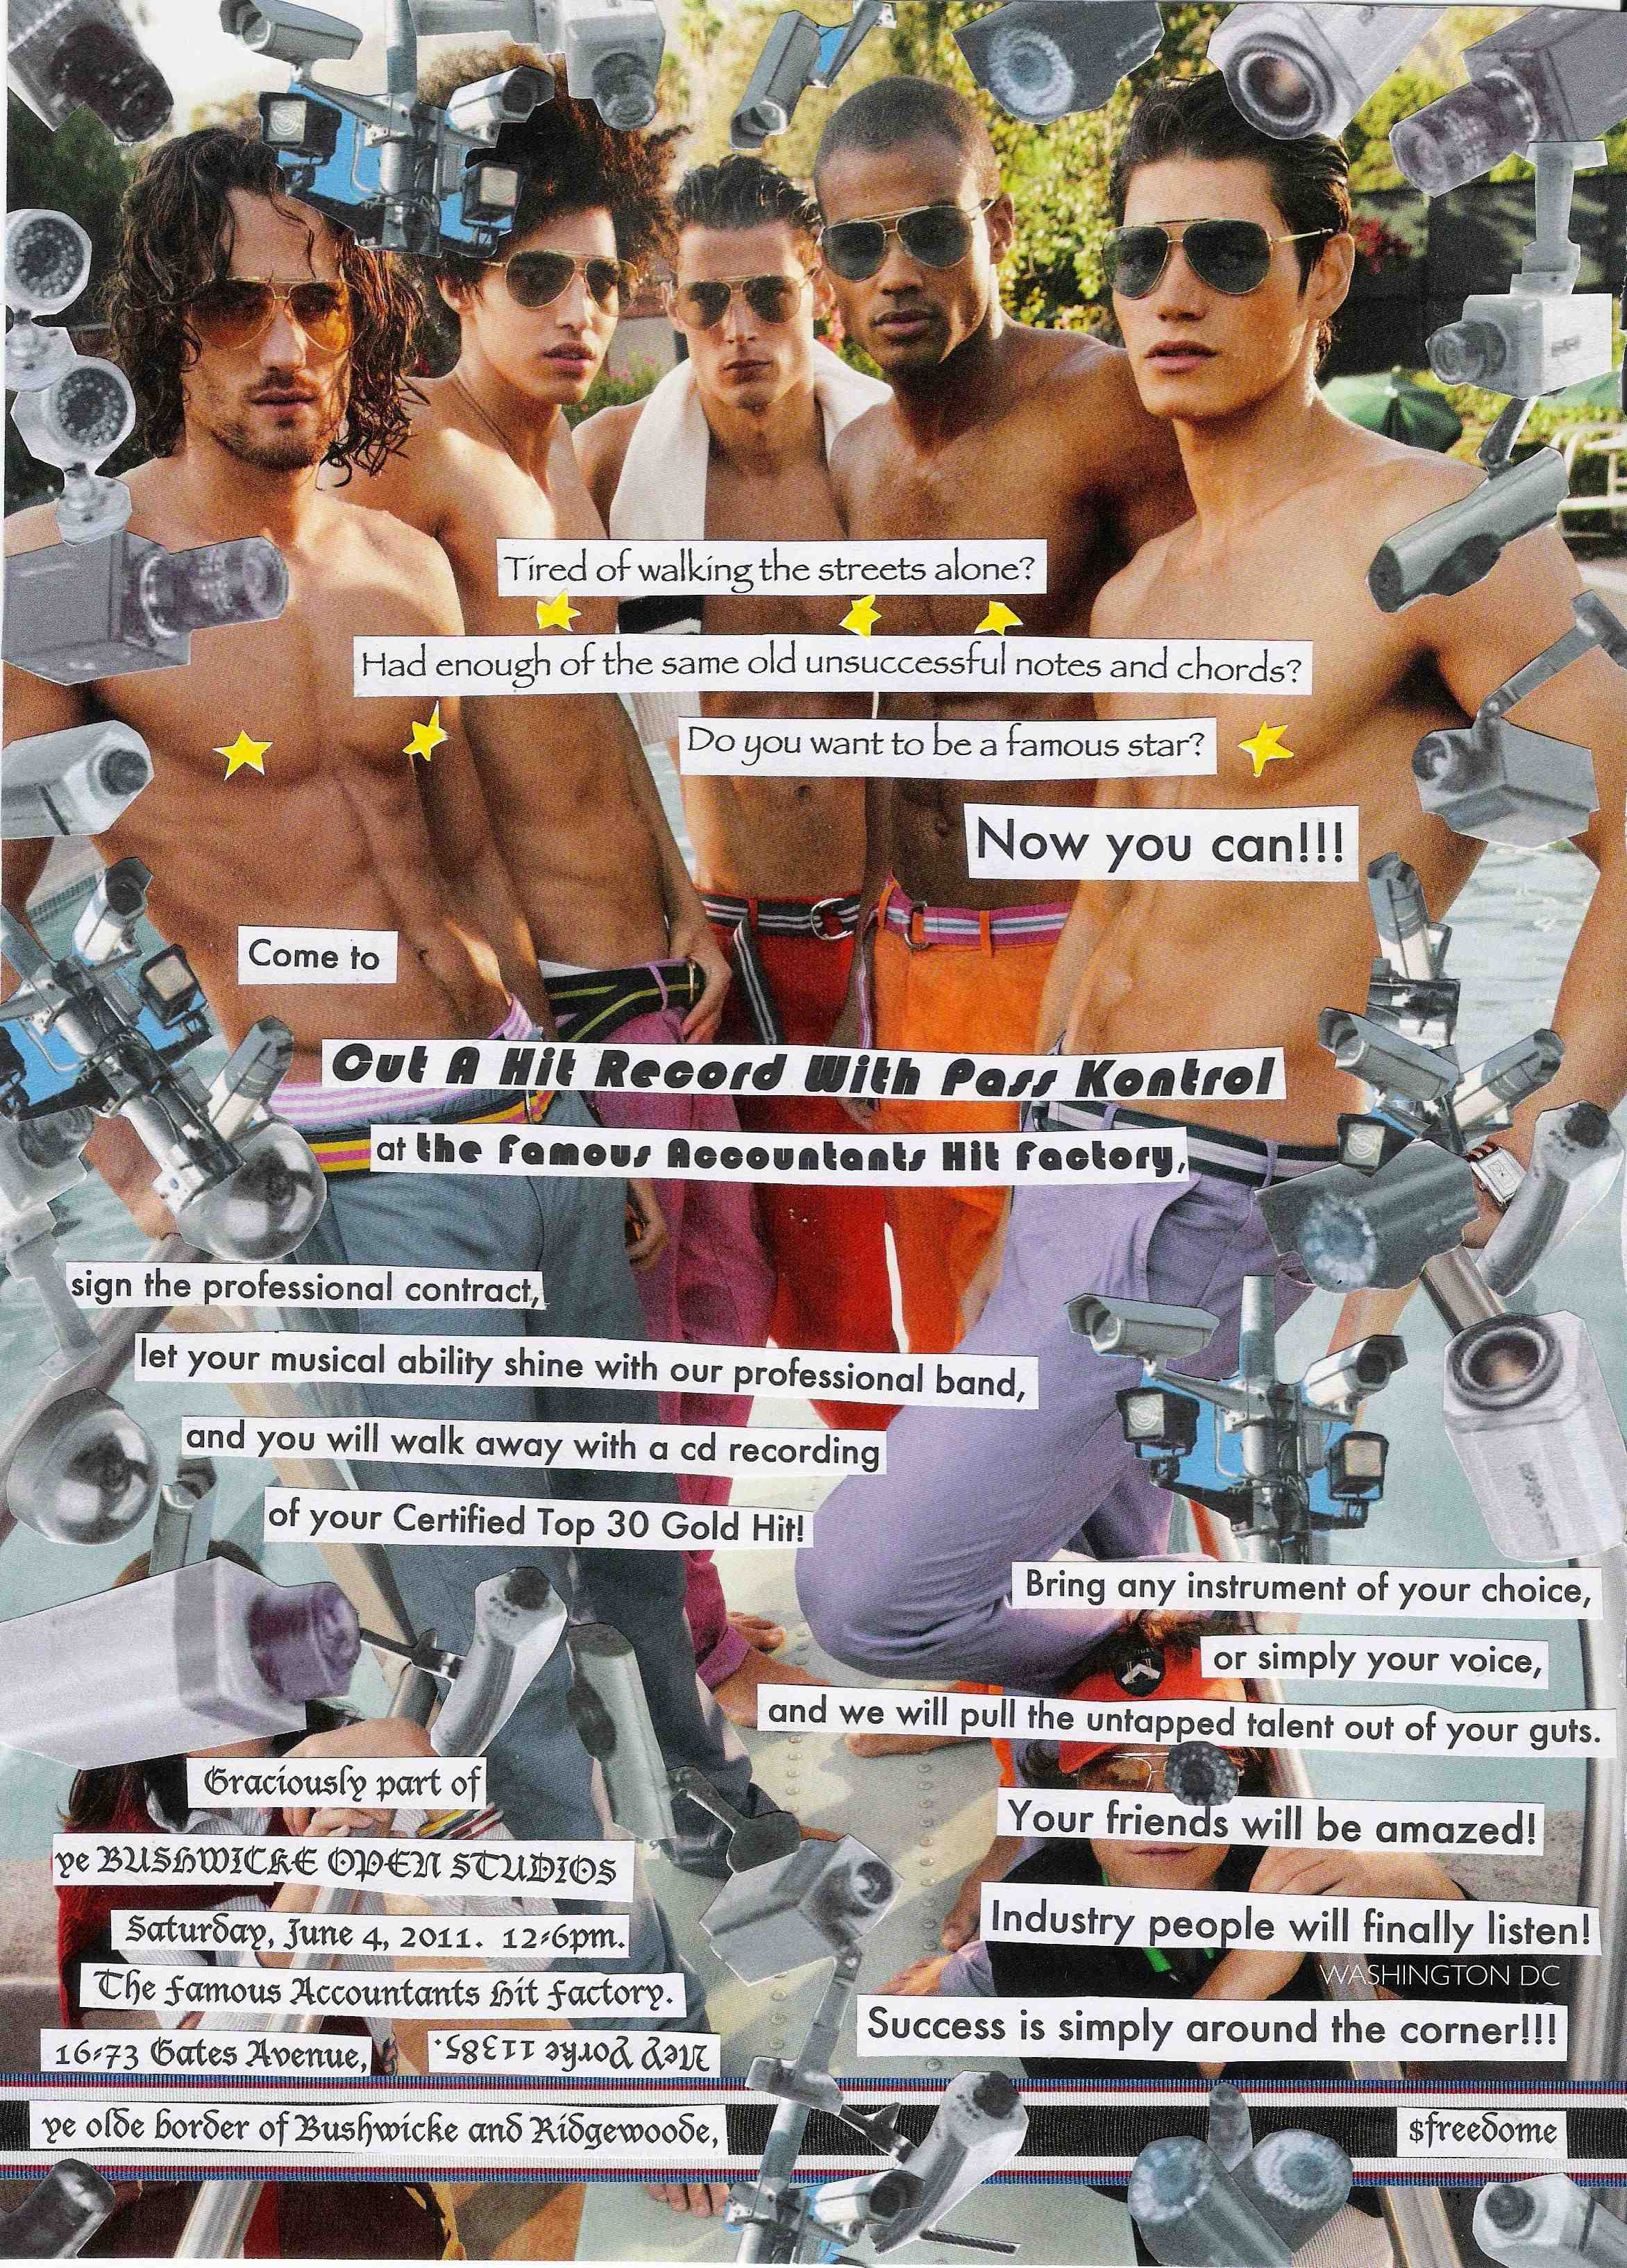 cut a hit record with pass kontrol 2011 flier 2_website.jpg